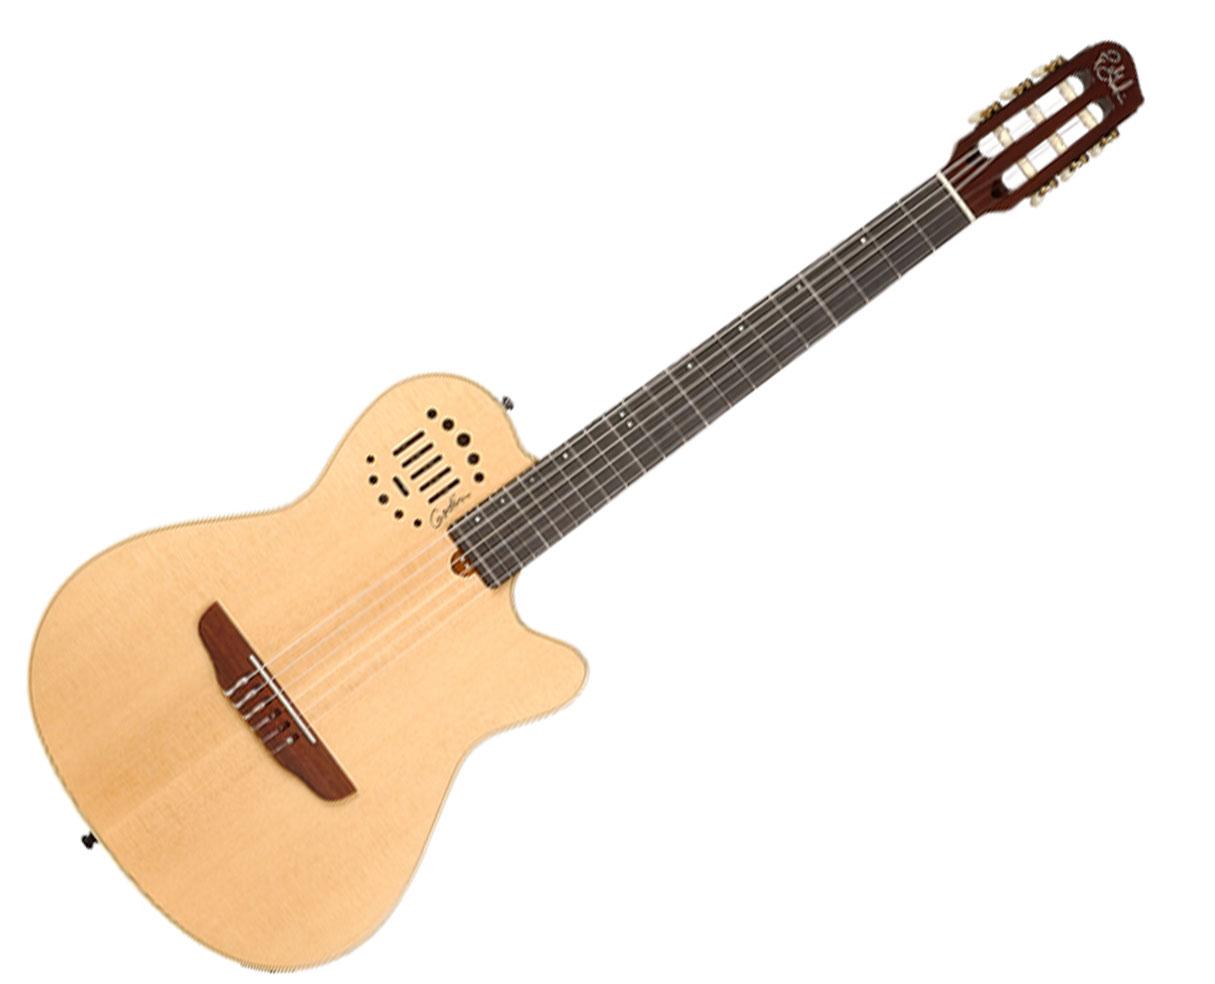 godin guitars multiac nylon duet ambiance electric acoustic nylon string guitar ebay. Black Bedroom Furniture Sets. Home Design Ideas